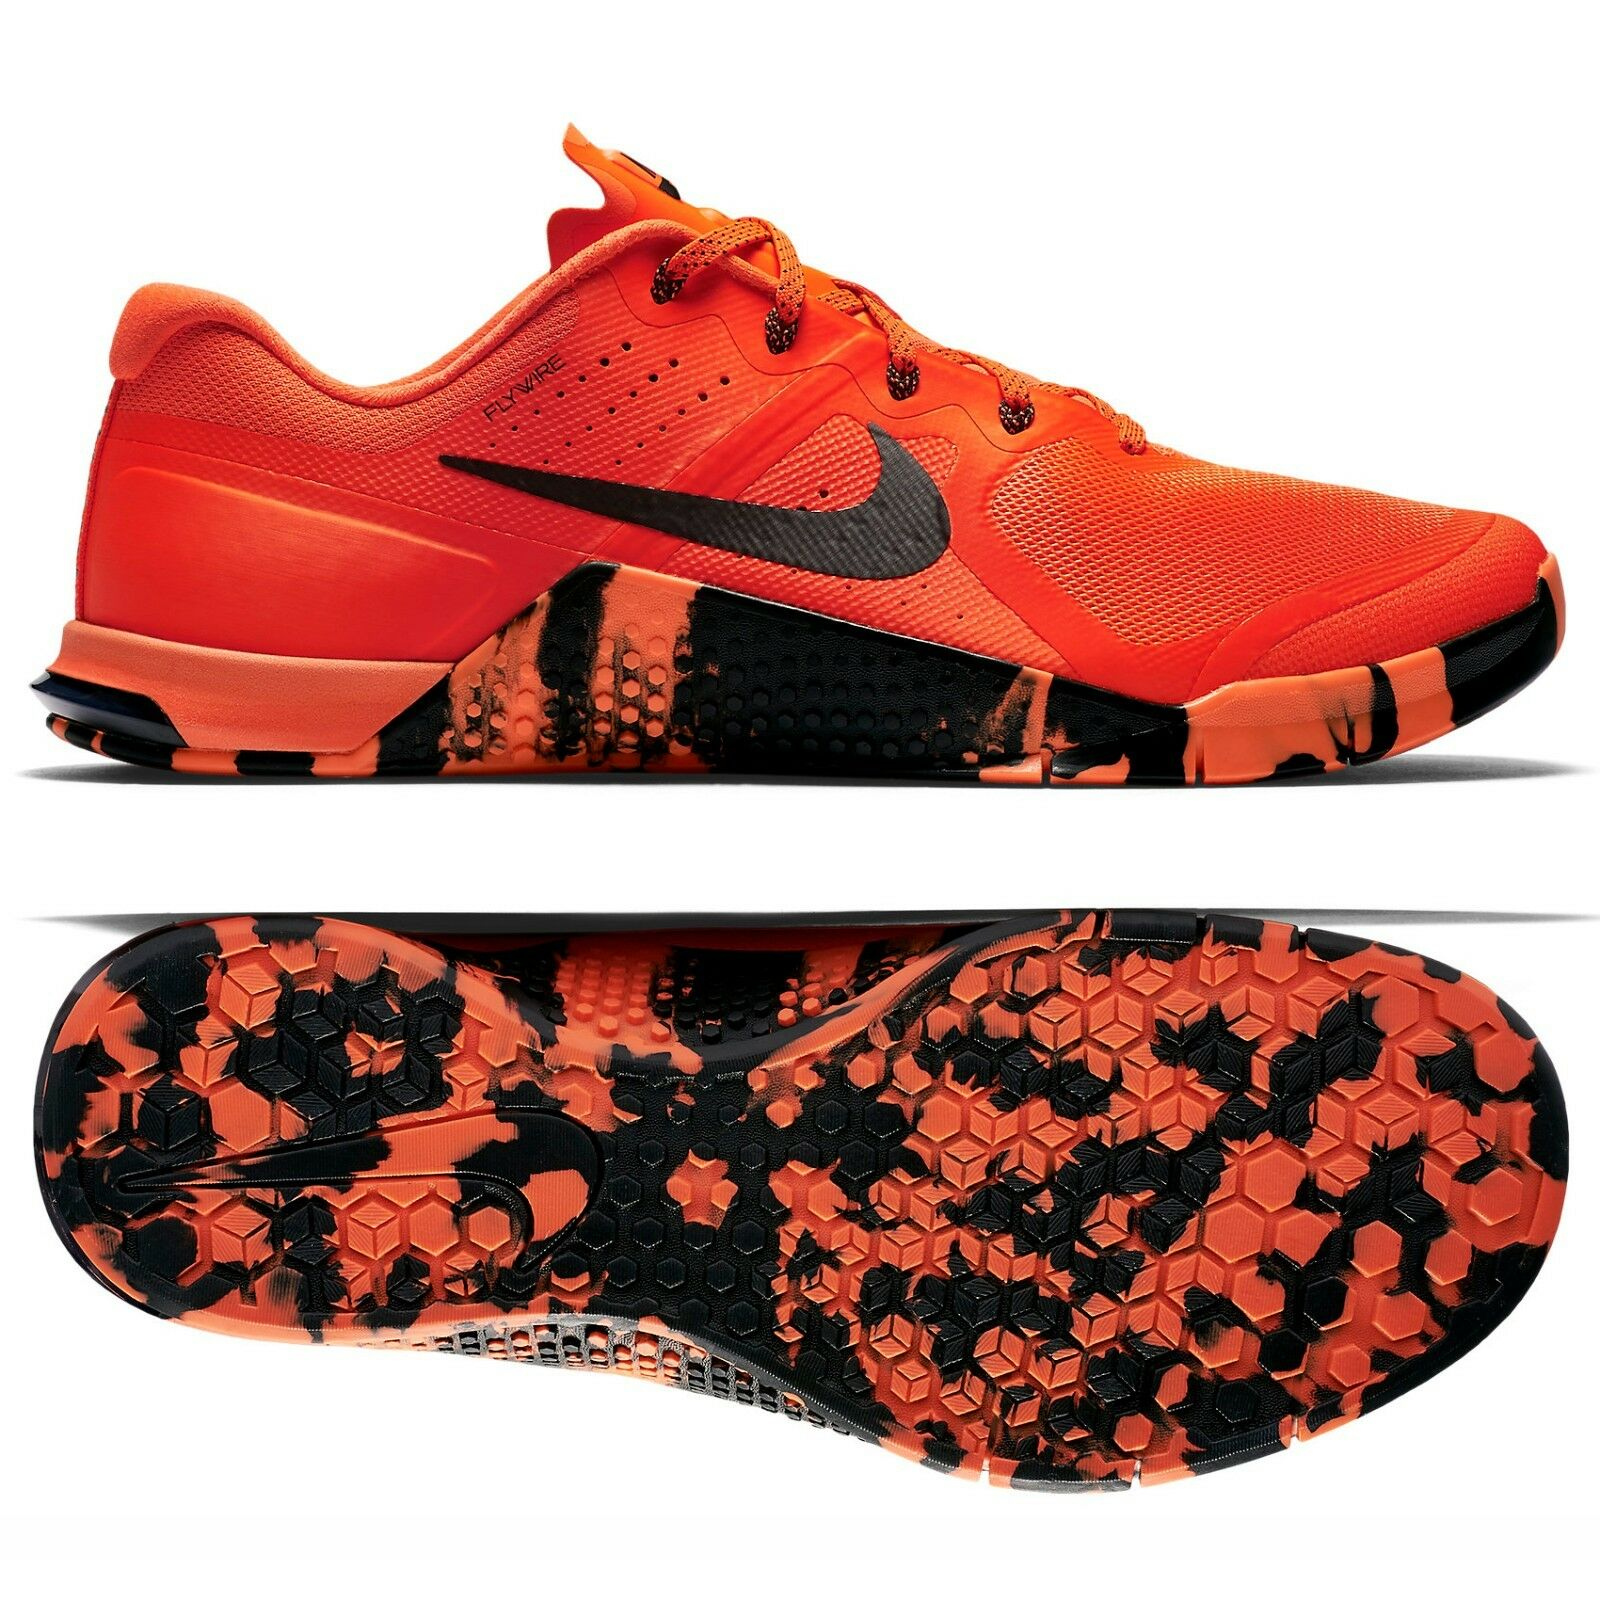 Nike Metcon 2 AMP 'Strong As Steel' 819902-600 Total Crimson/Black Men's Shoes